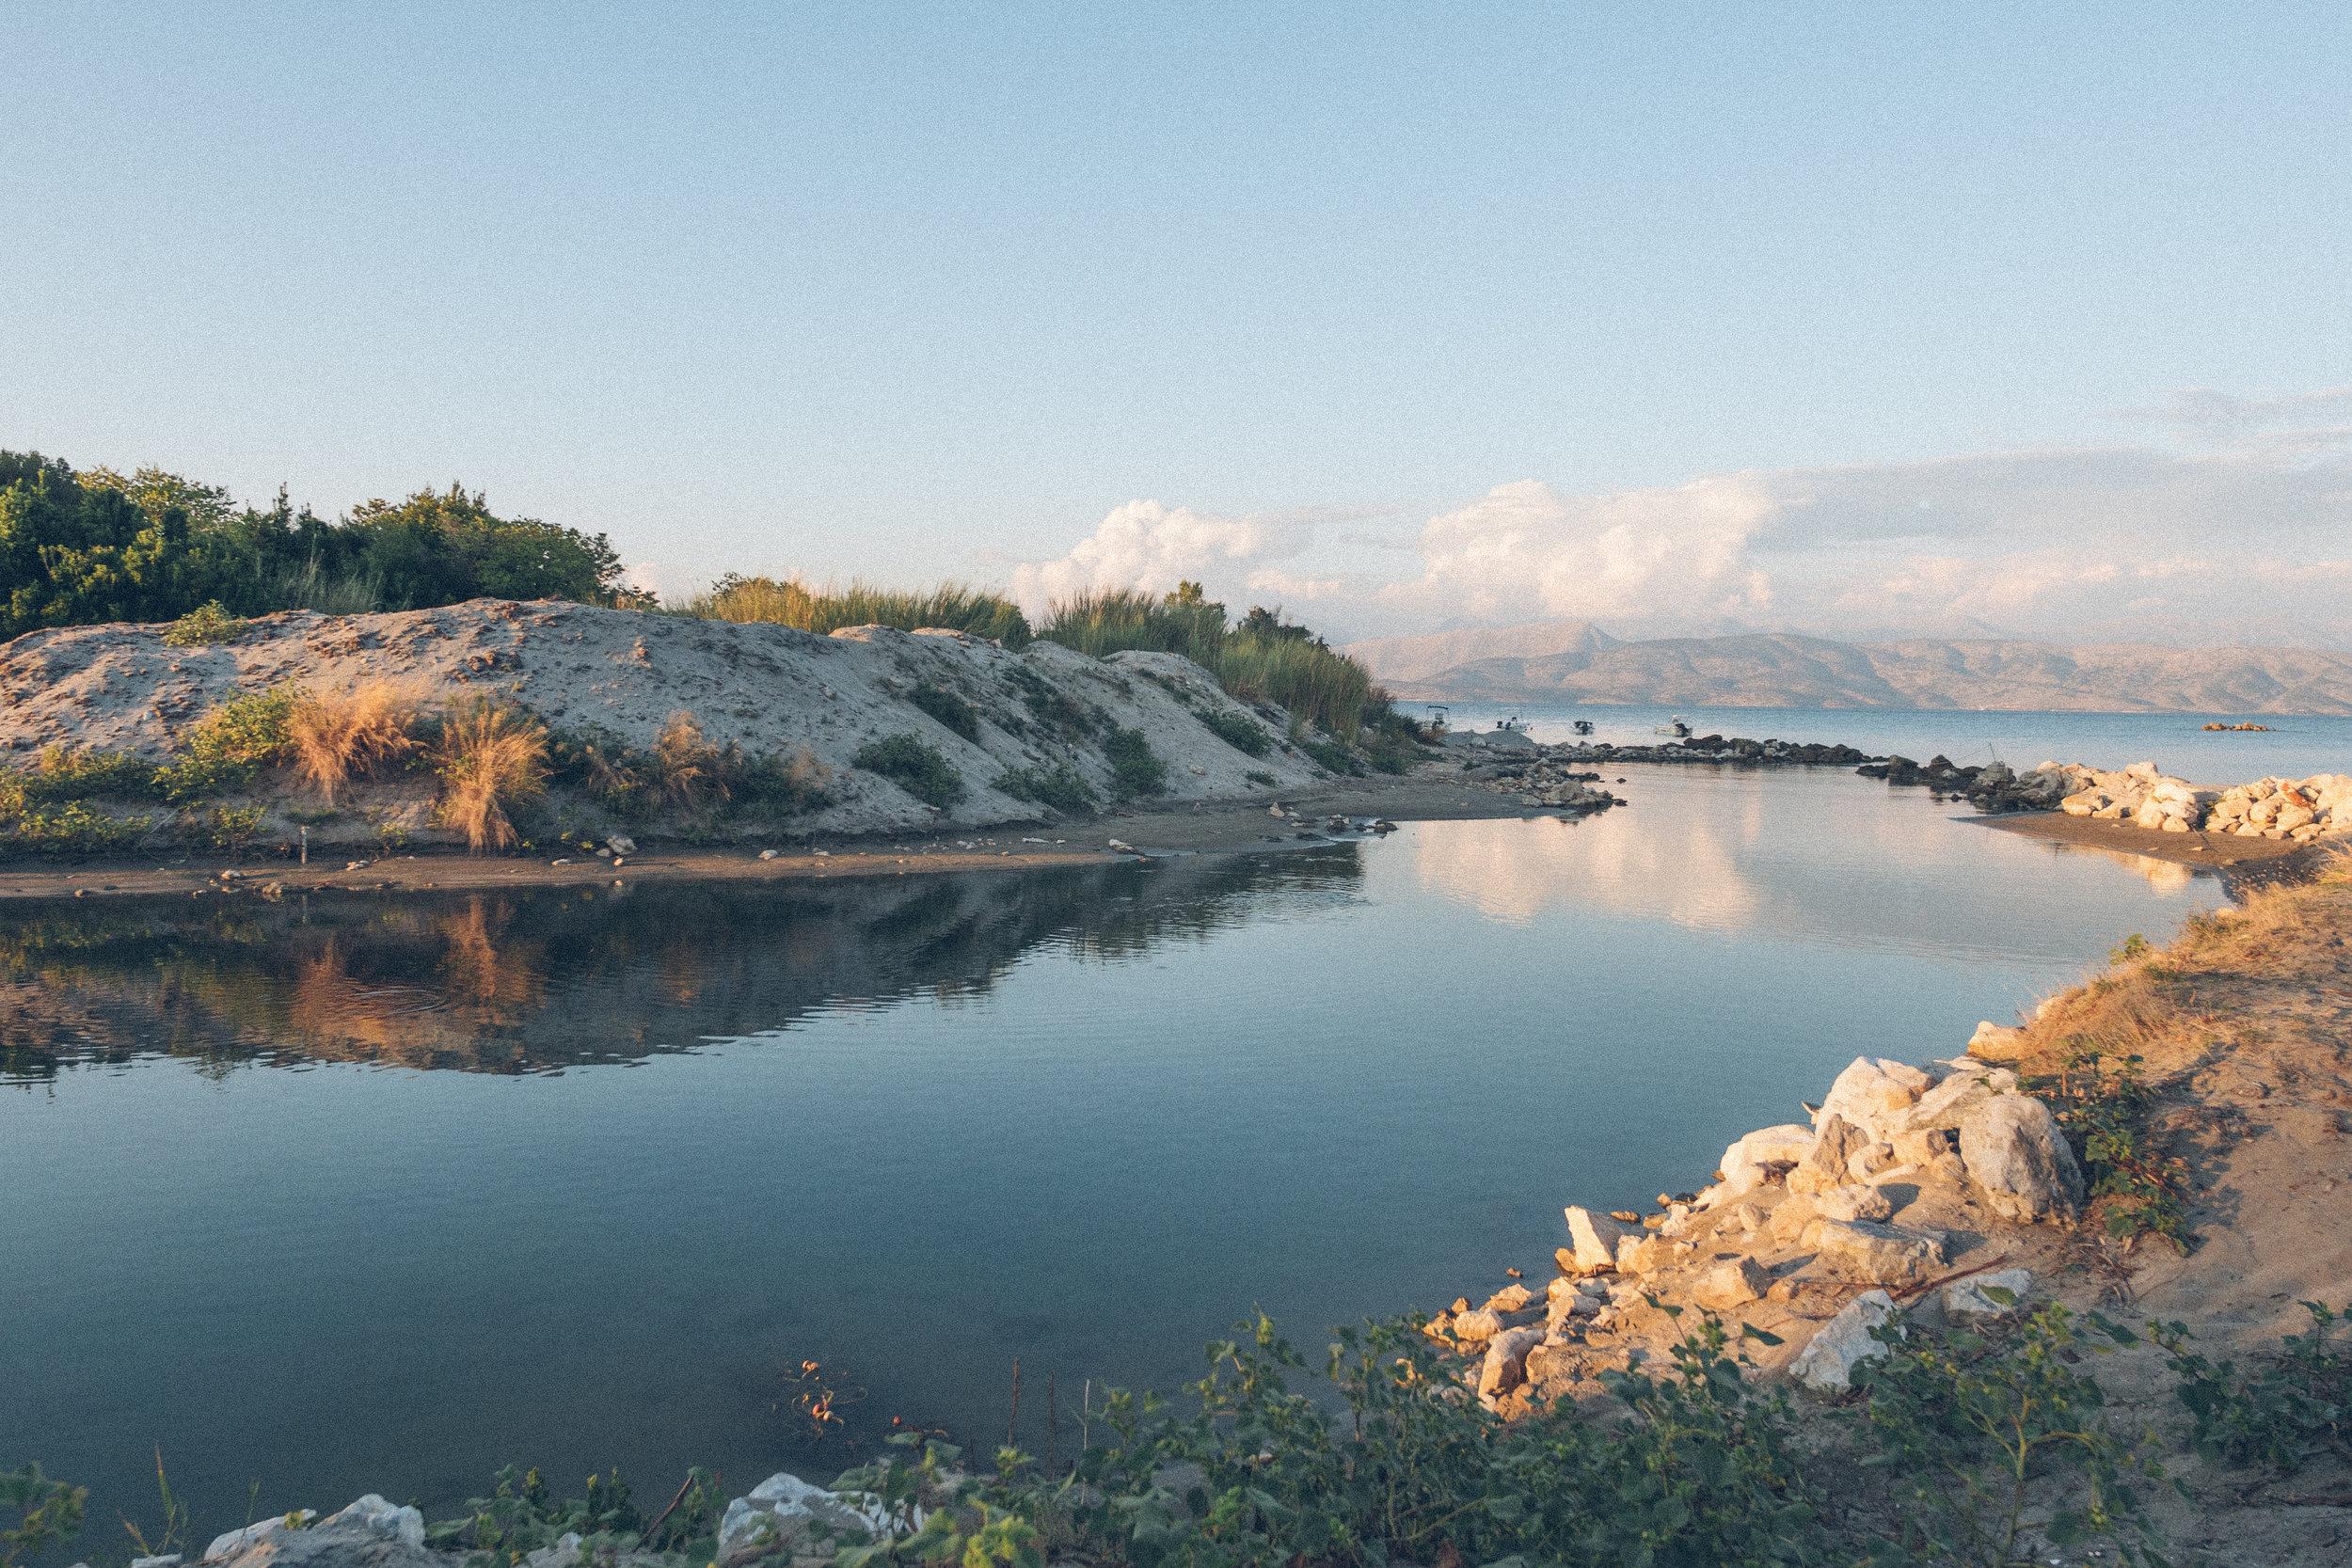 beach front in Agios stefanos  in corfu near pyramid city